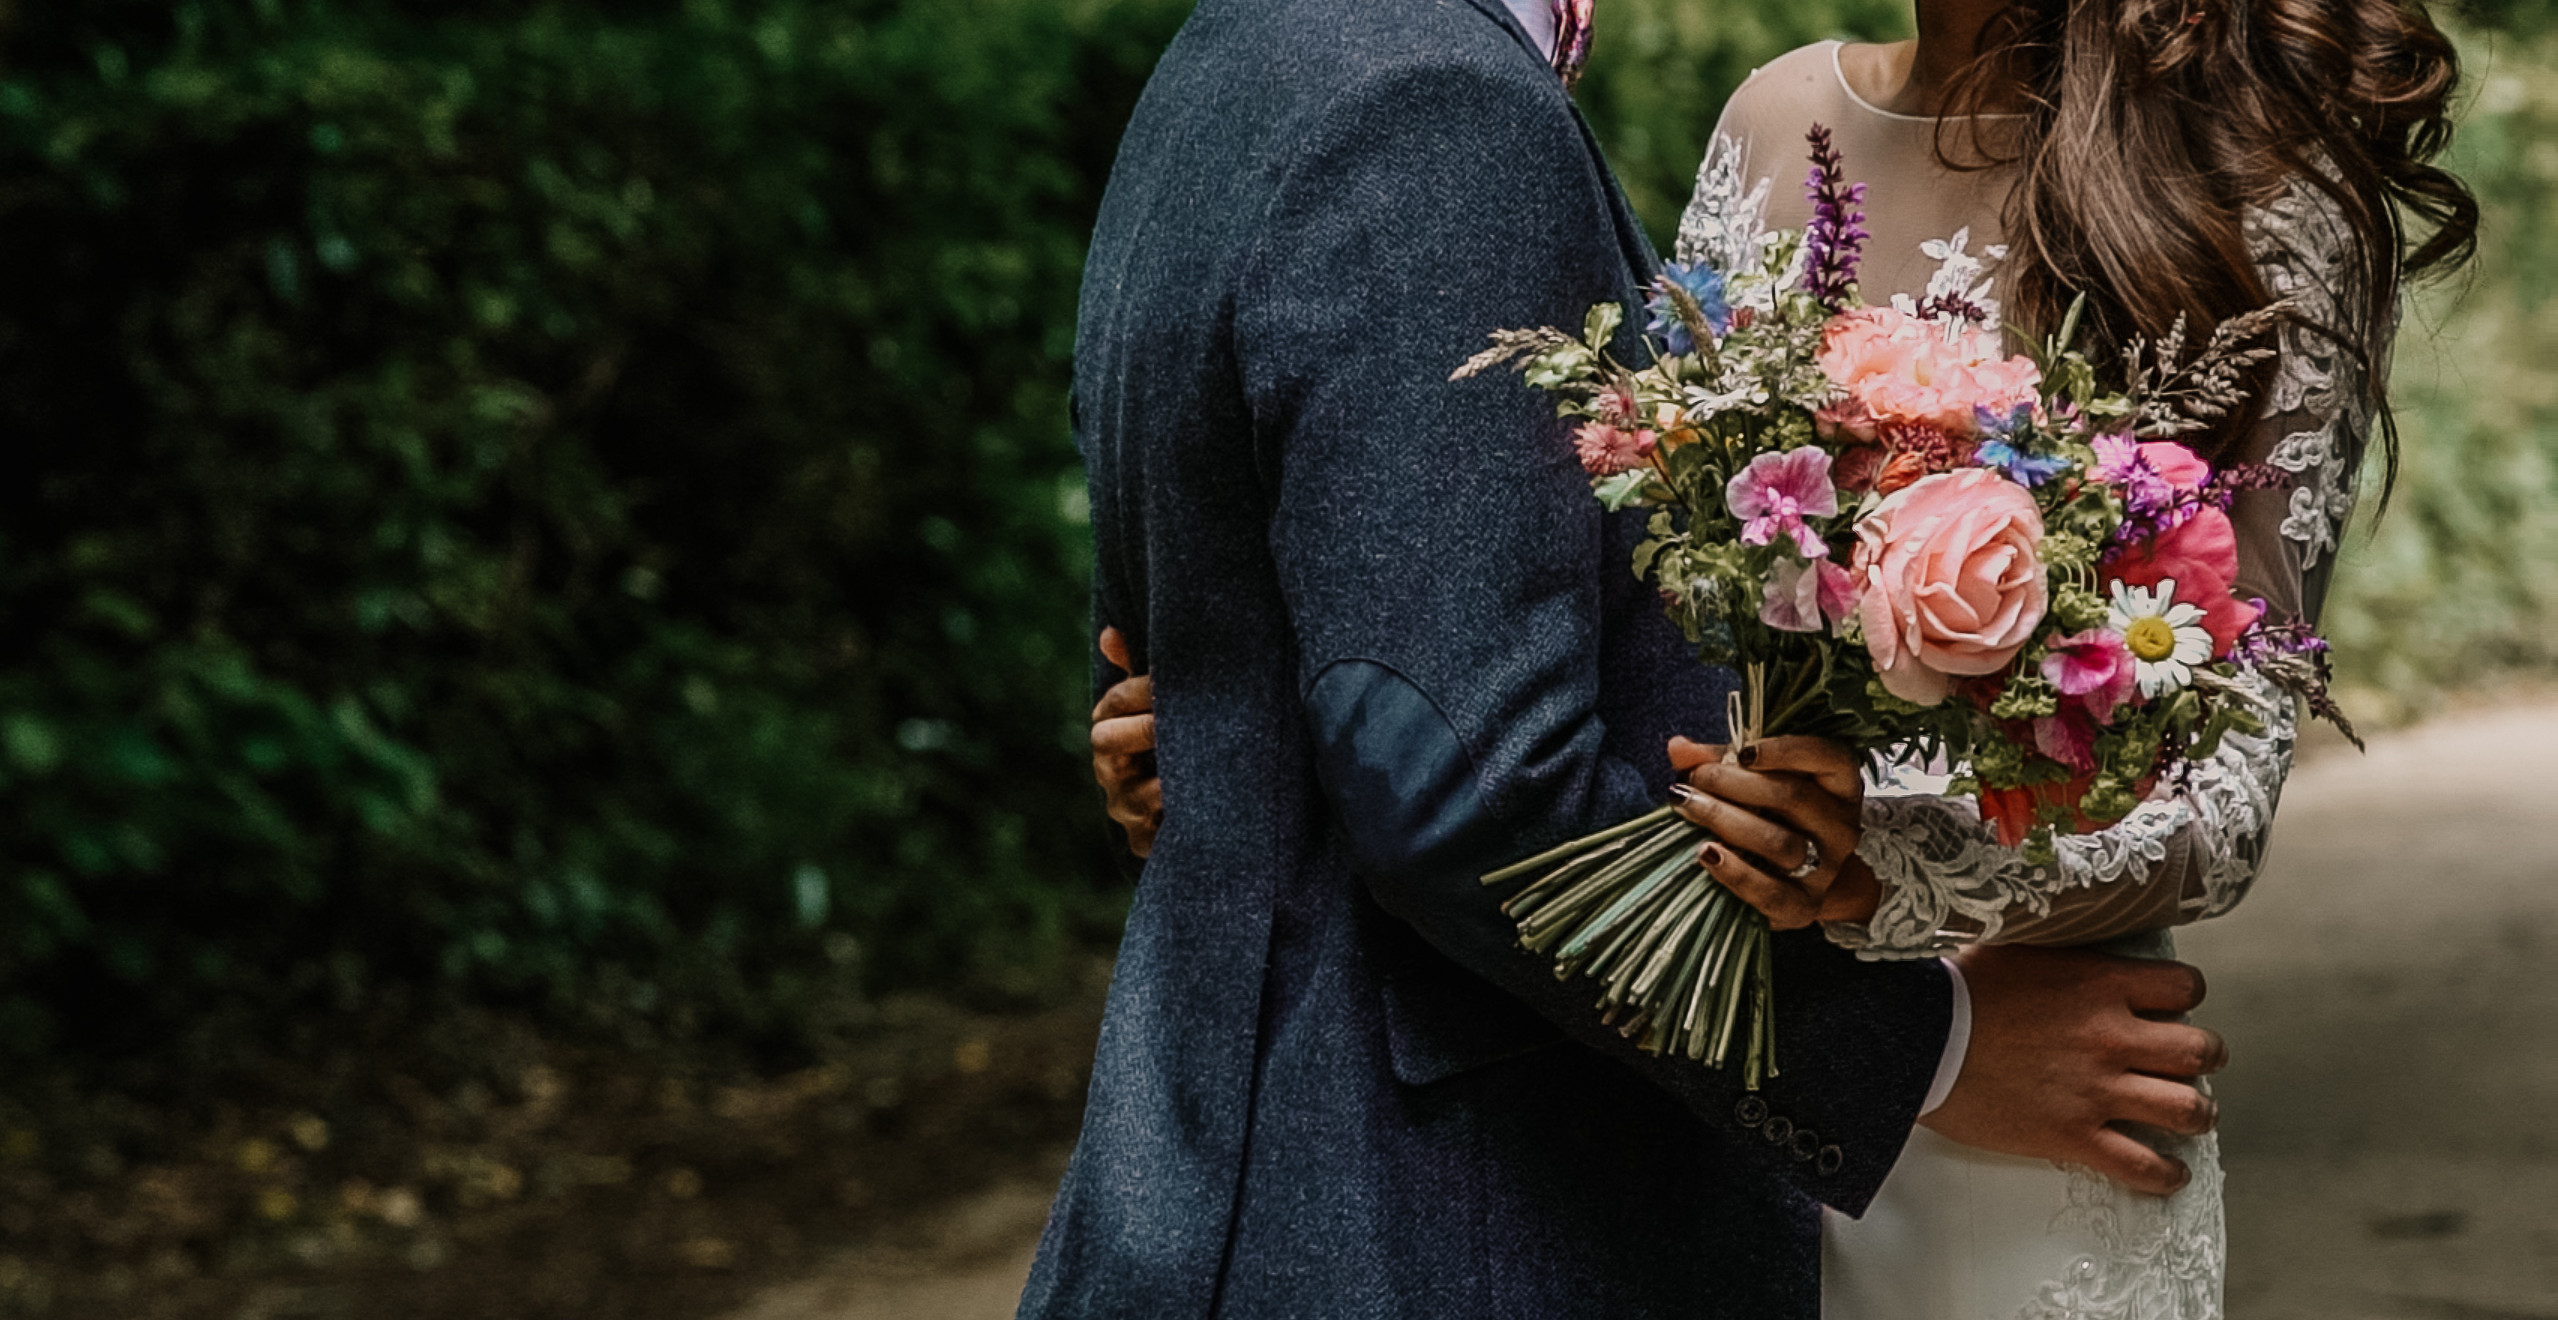 Boho, wild flower bouquet, lace wedding dress, tweed groom suit